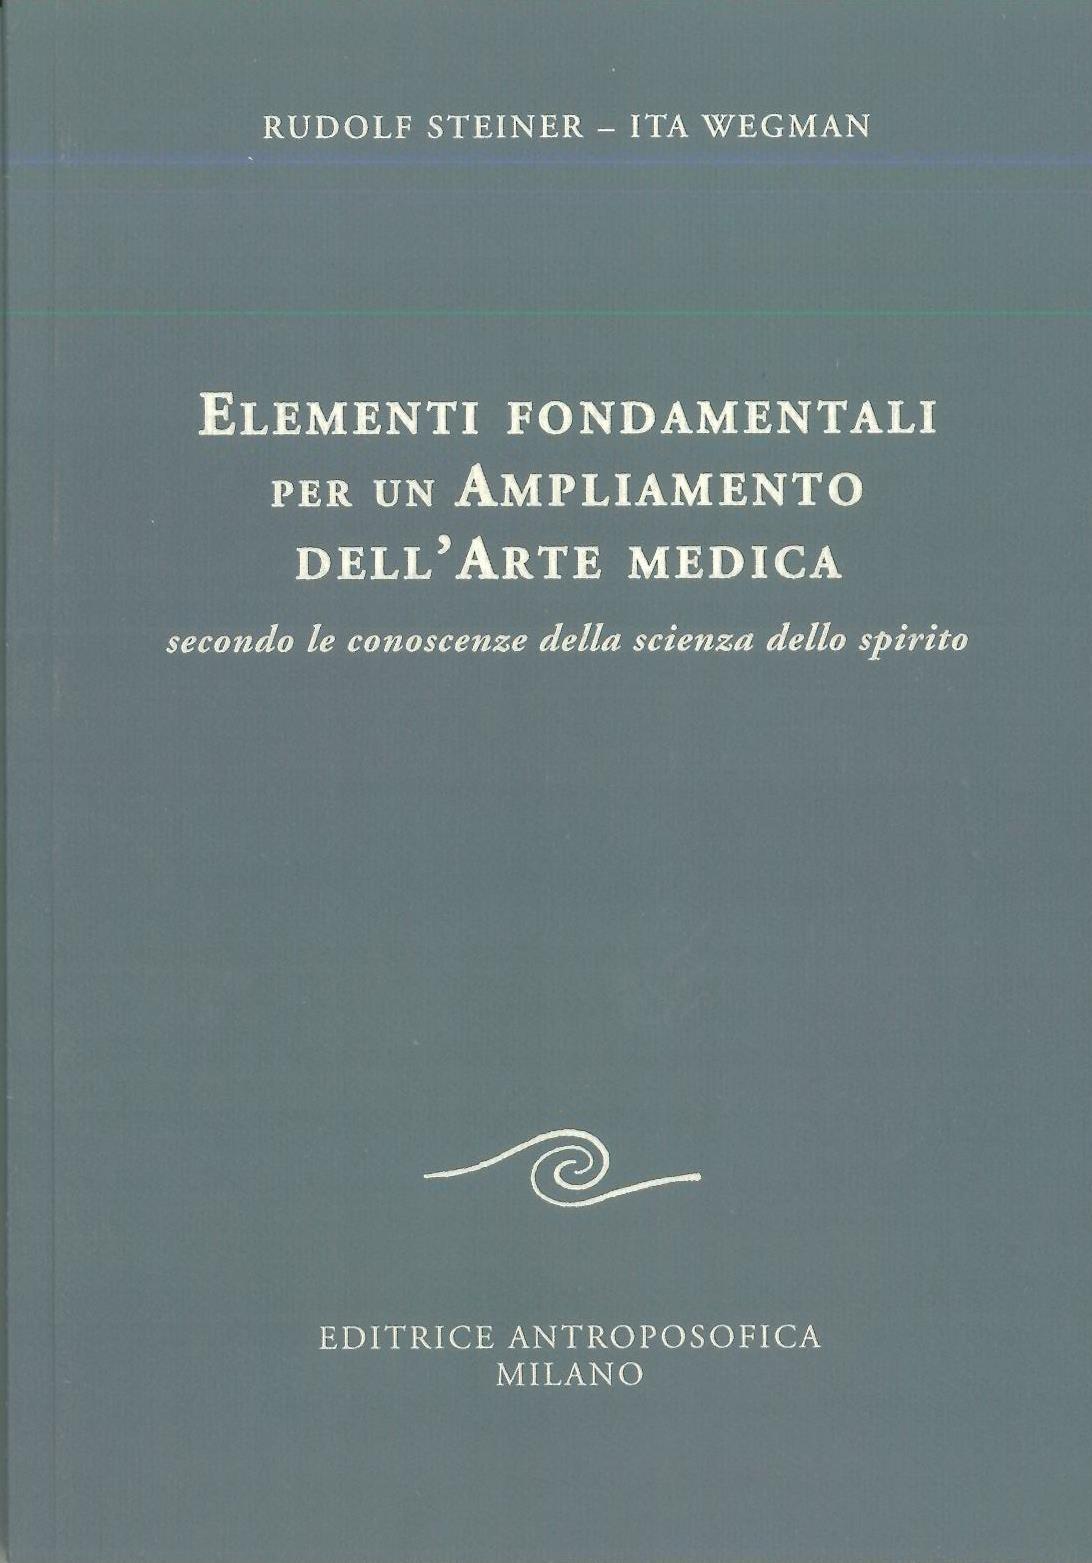 Elementi fondamental...